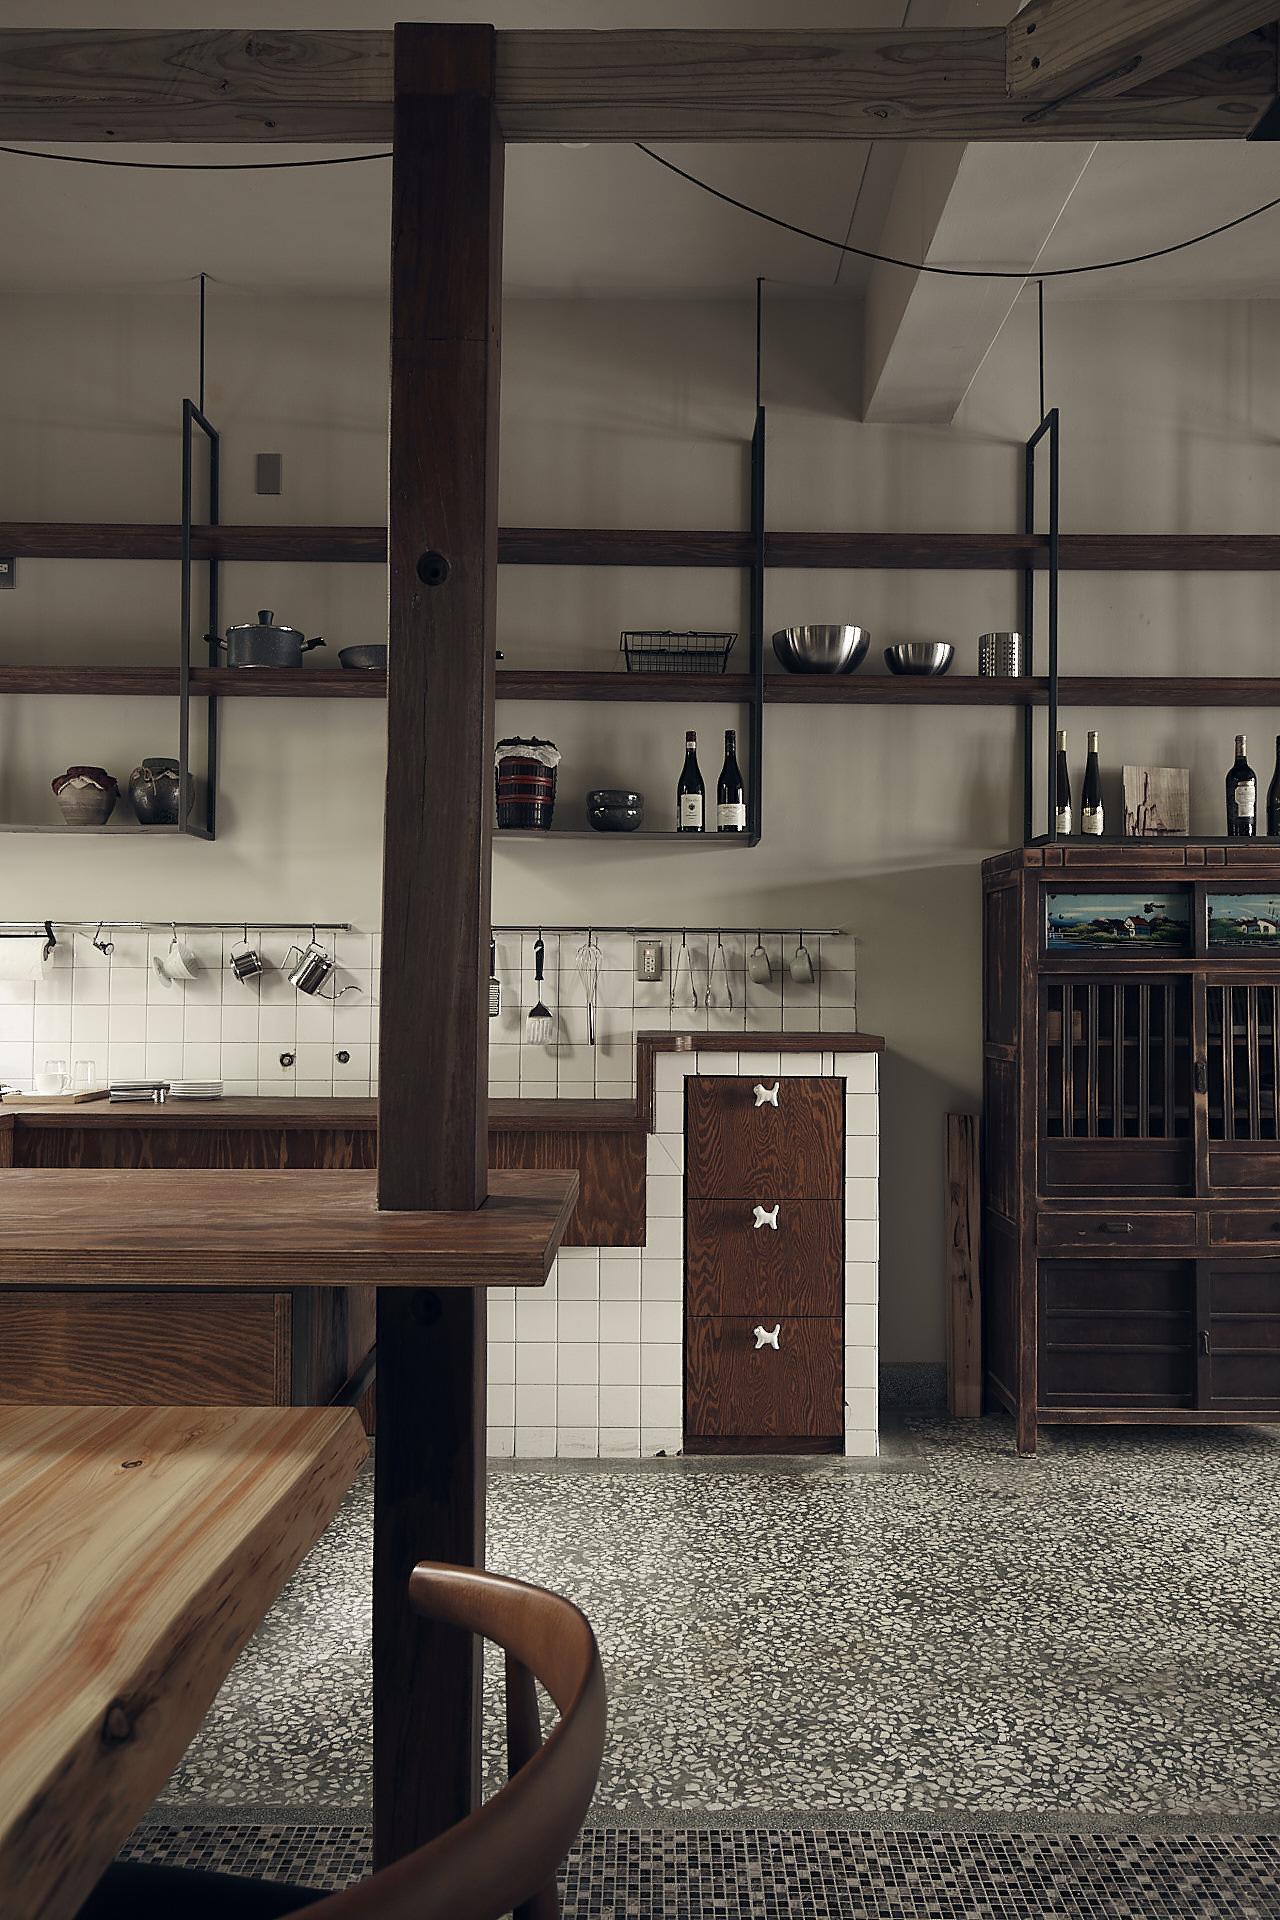 Interior Image 398